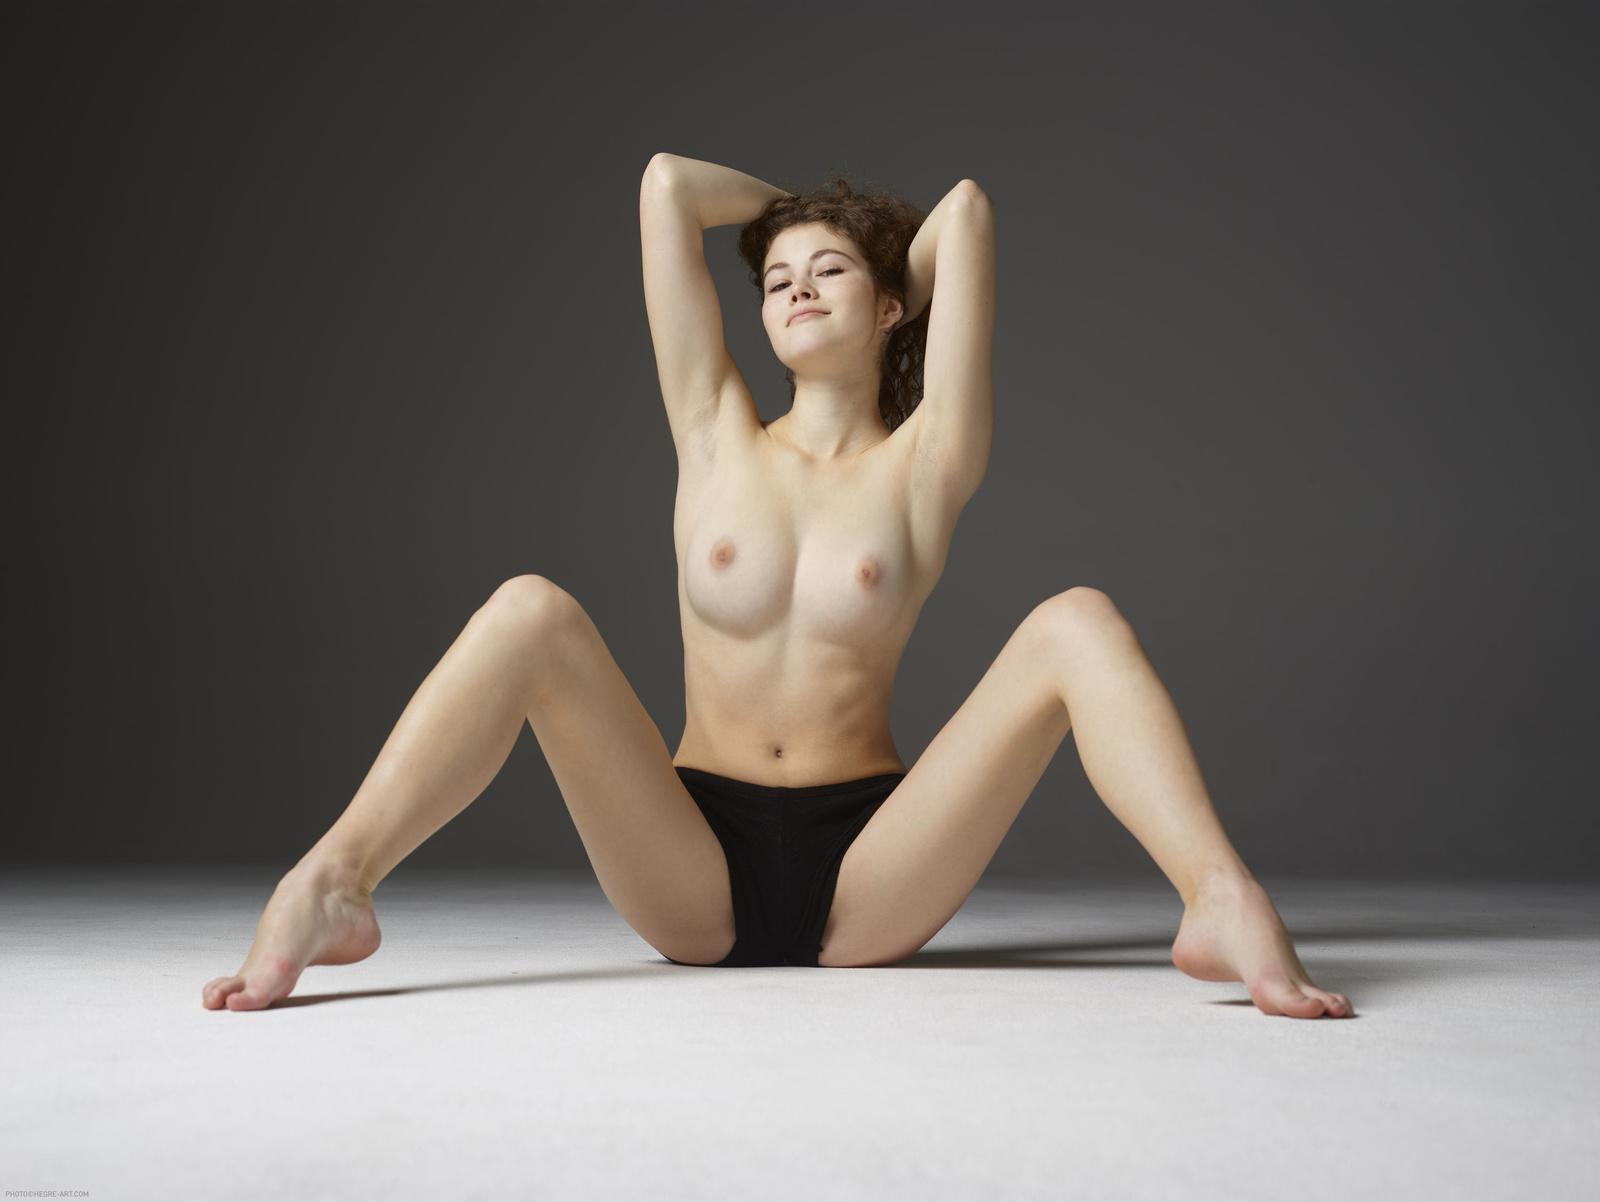 Free sex heidi fleiss nude